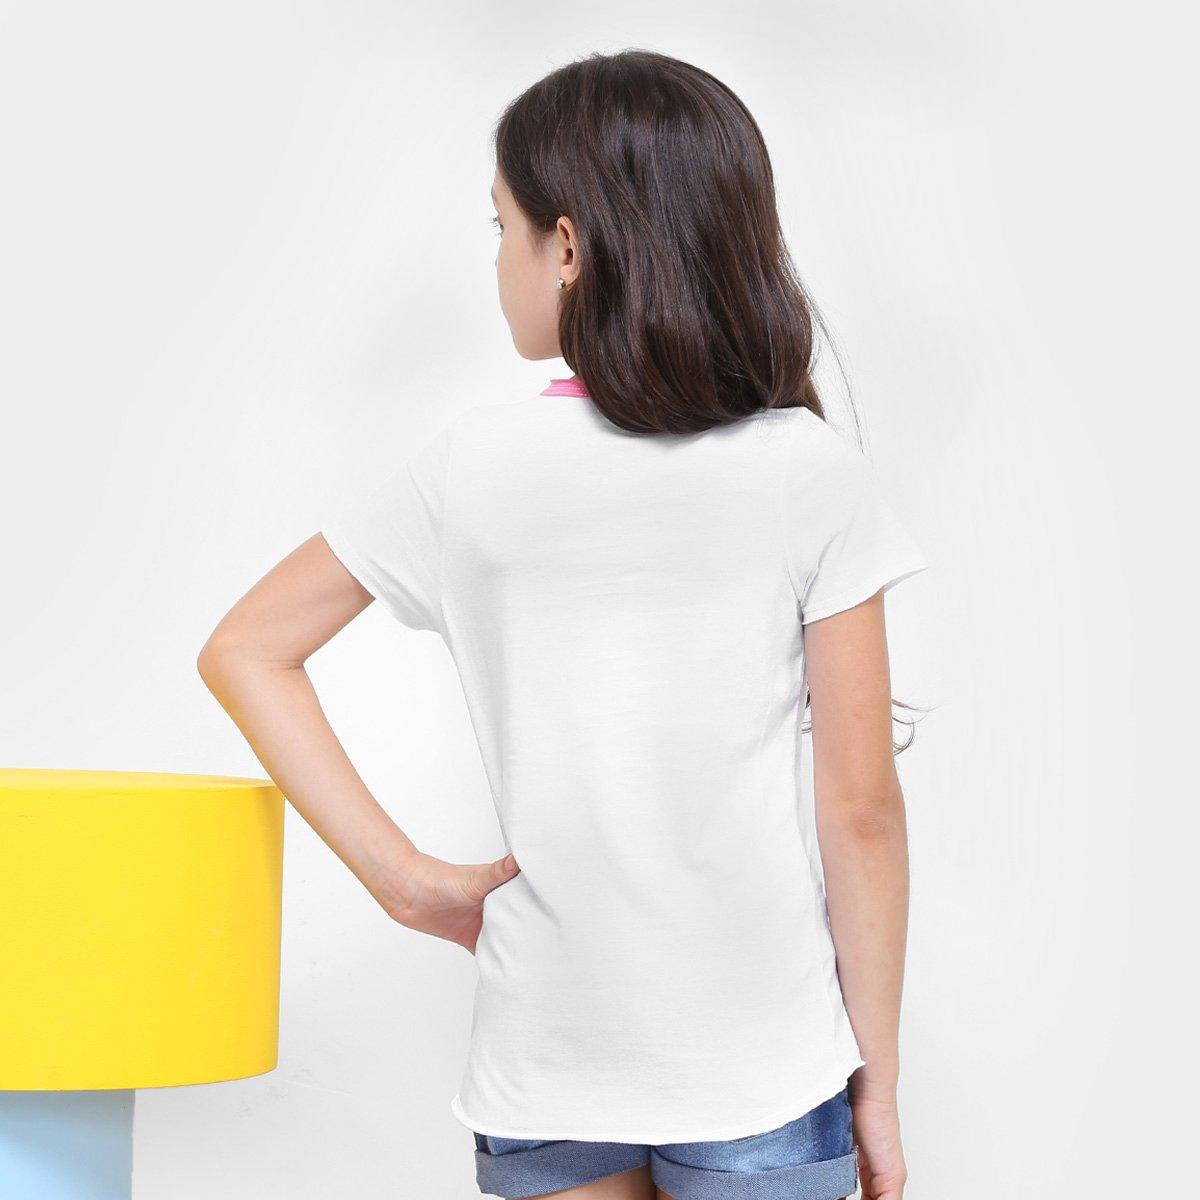 Camiseta Bela Branco Infantil Disney Camiseta Disney Feminina Branco Adormecida Adormecida Feminina Infantil Camiseta Infantil Bela Bw1x6qdwPA